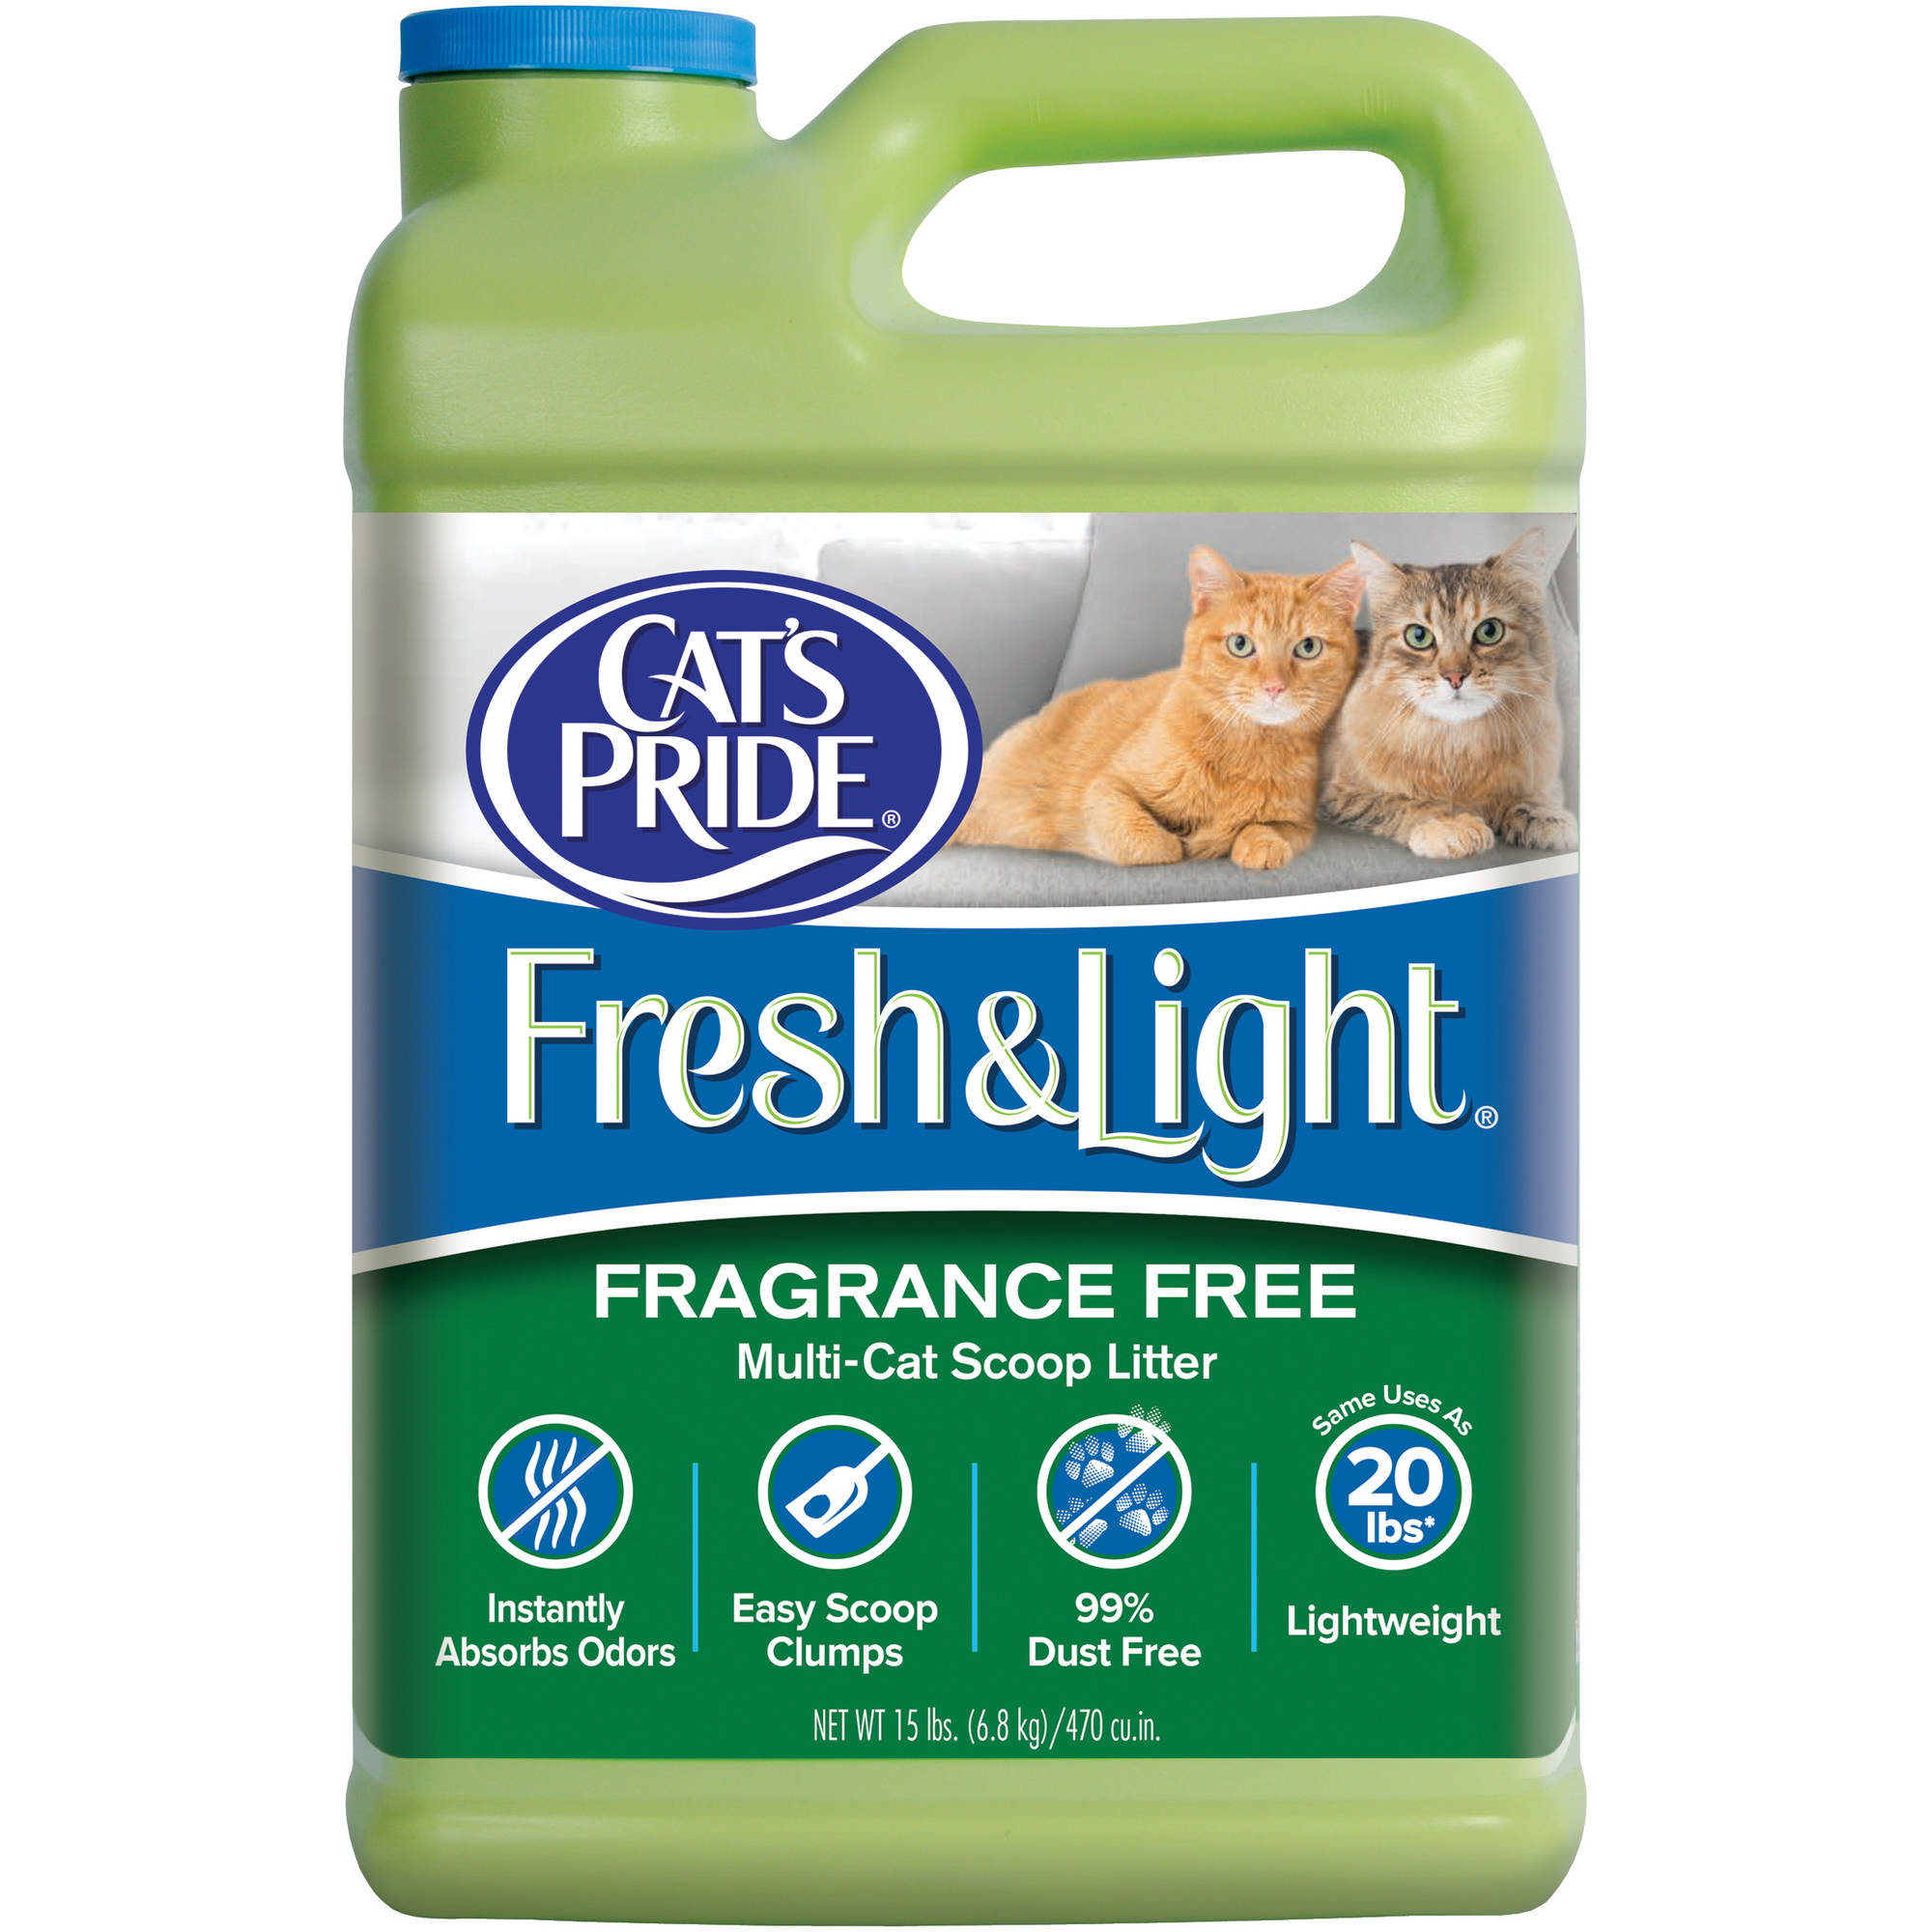 Cat's Pride Fresh & Light Premium Clumping Fragrance-Free Scoopable Cat Litter, 15 lb